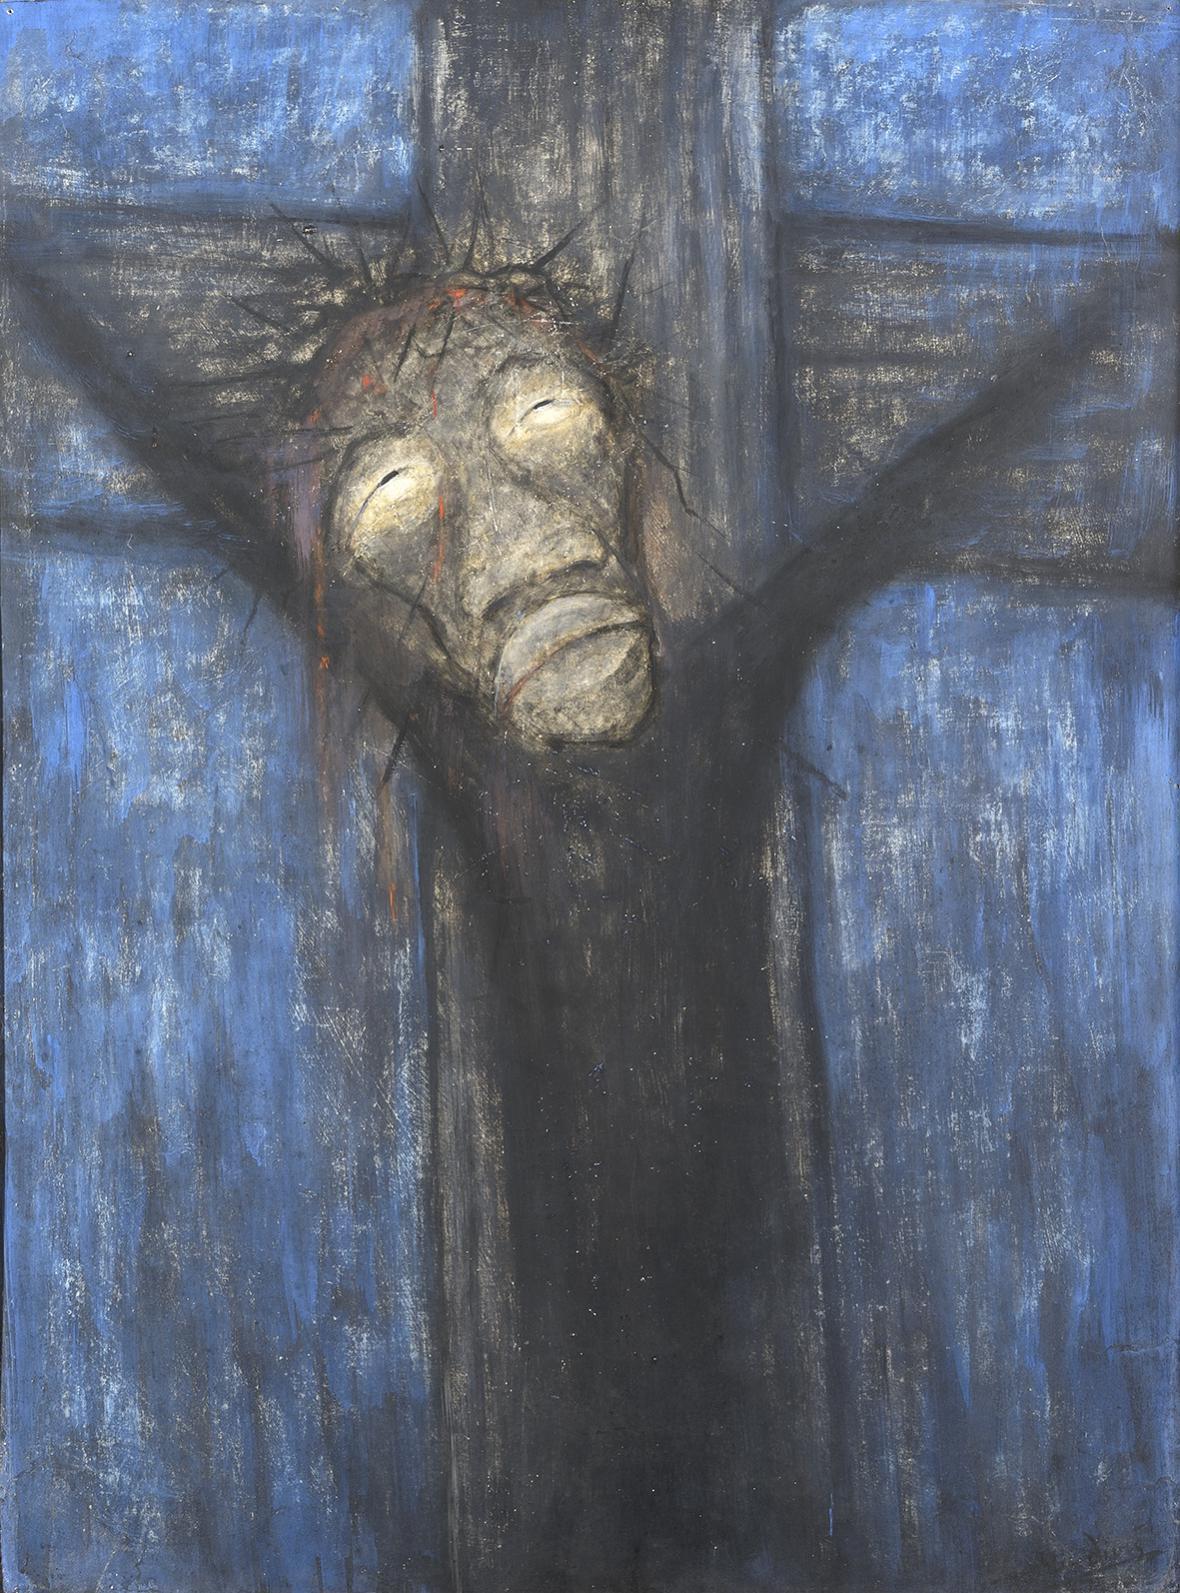 Alén Diviš / Kristus černochů, 1946